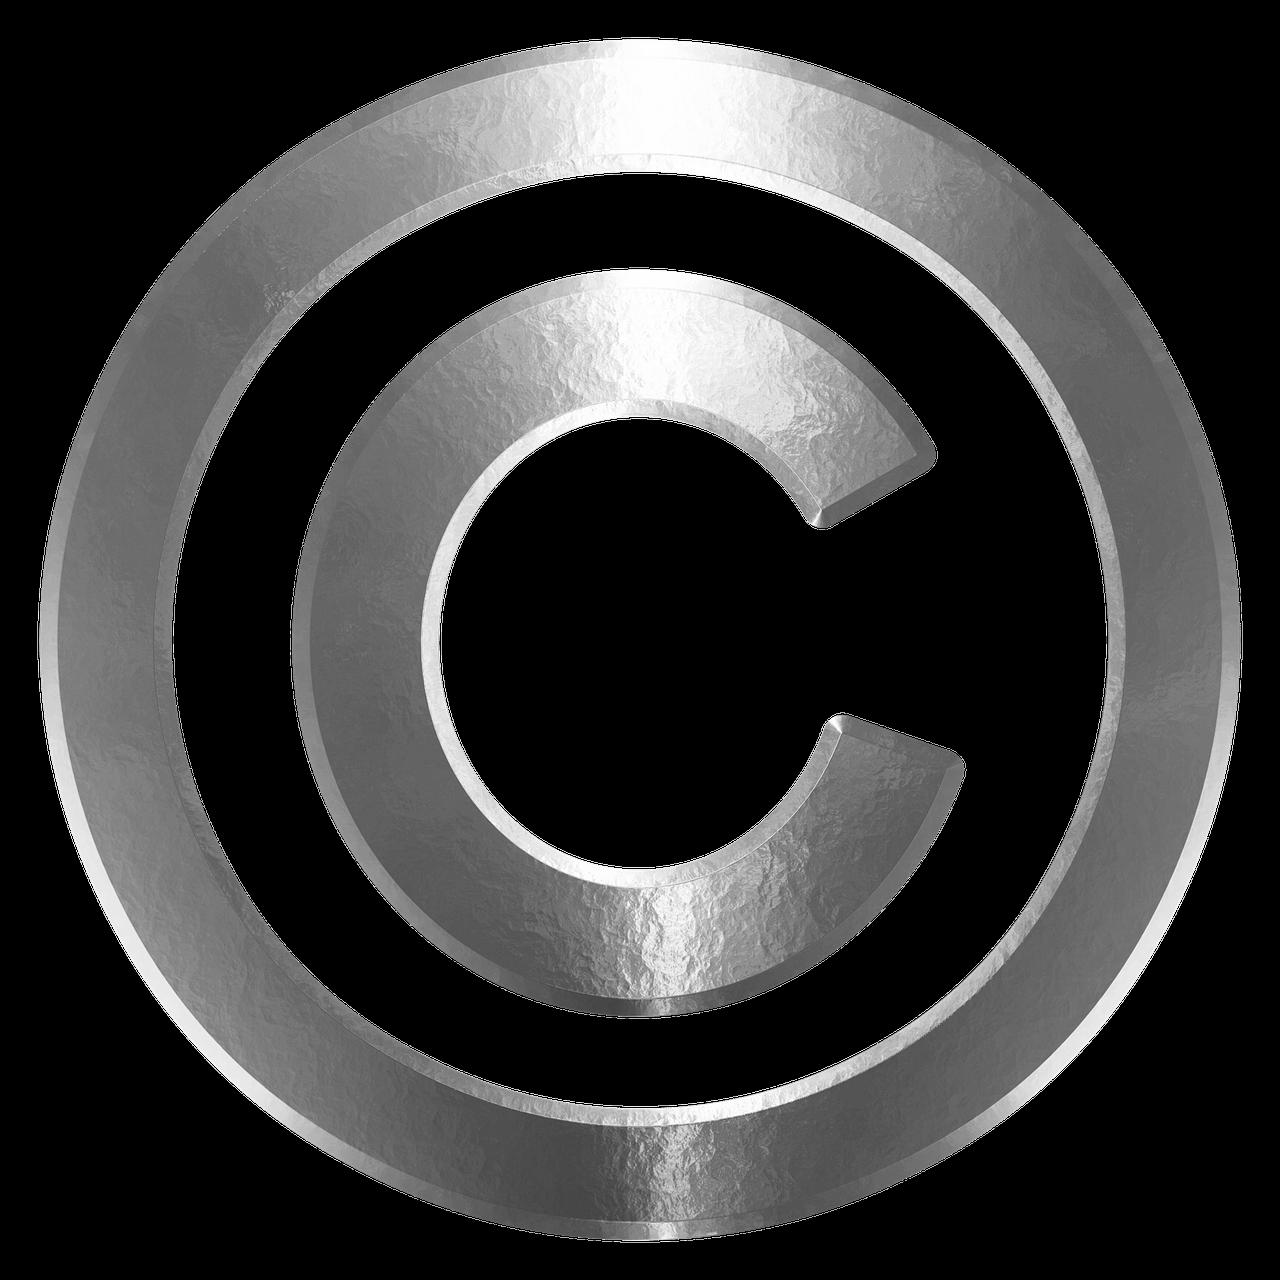 copyright statement